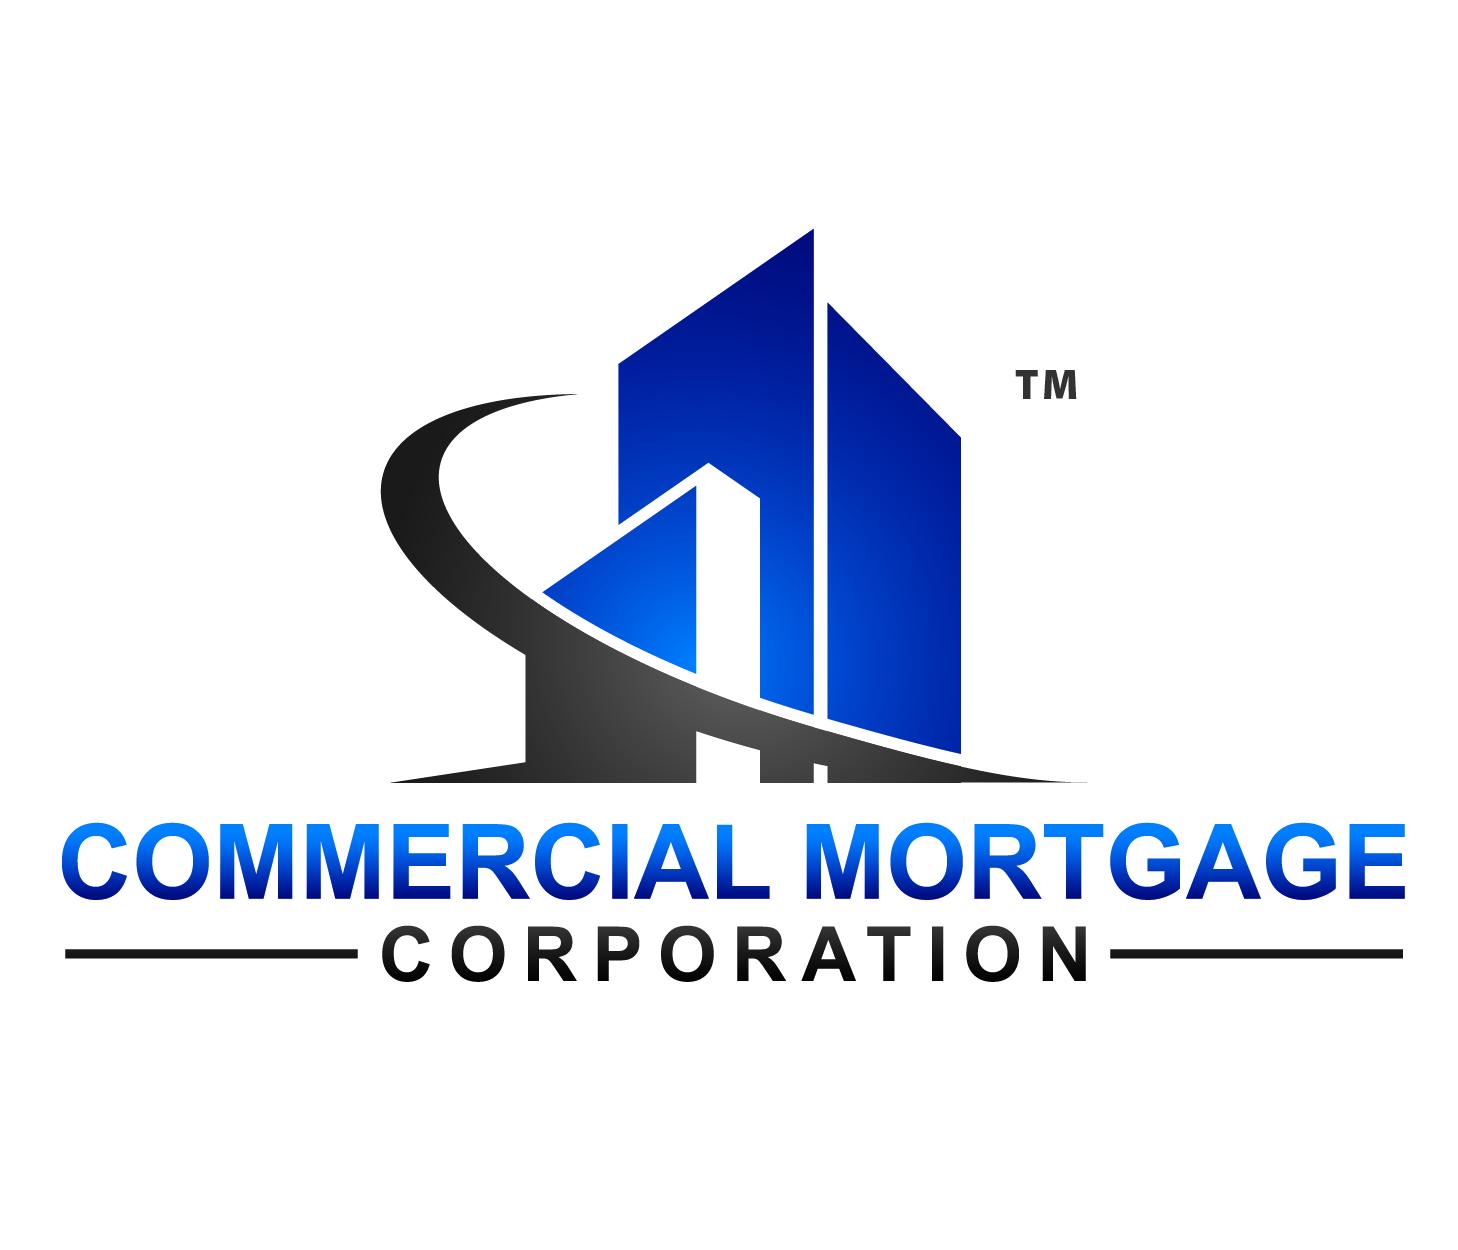 Written by: Steve Giagkou, Vice President | Broker, Commercial Mortgage Corporation